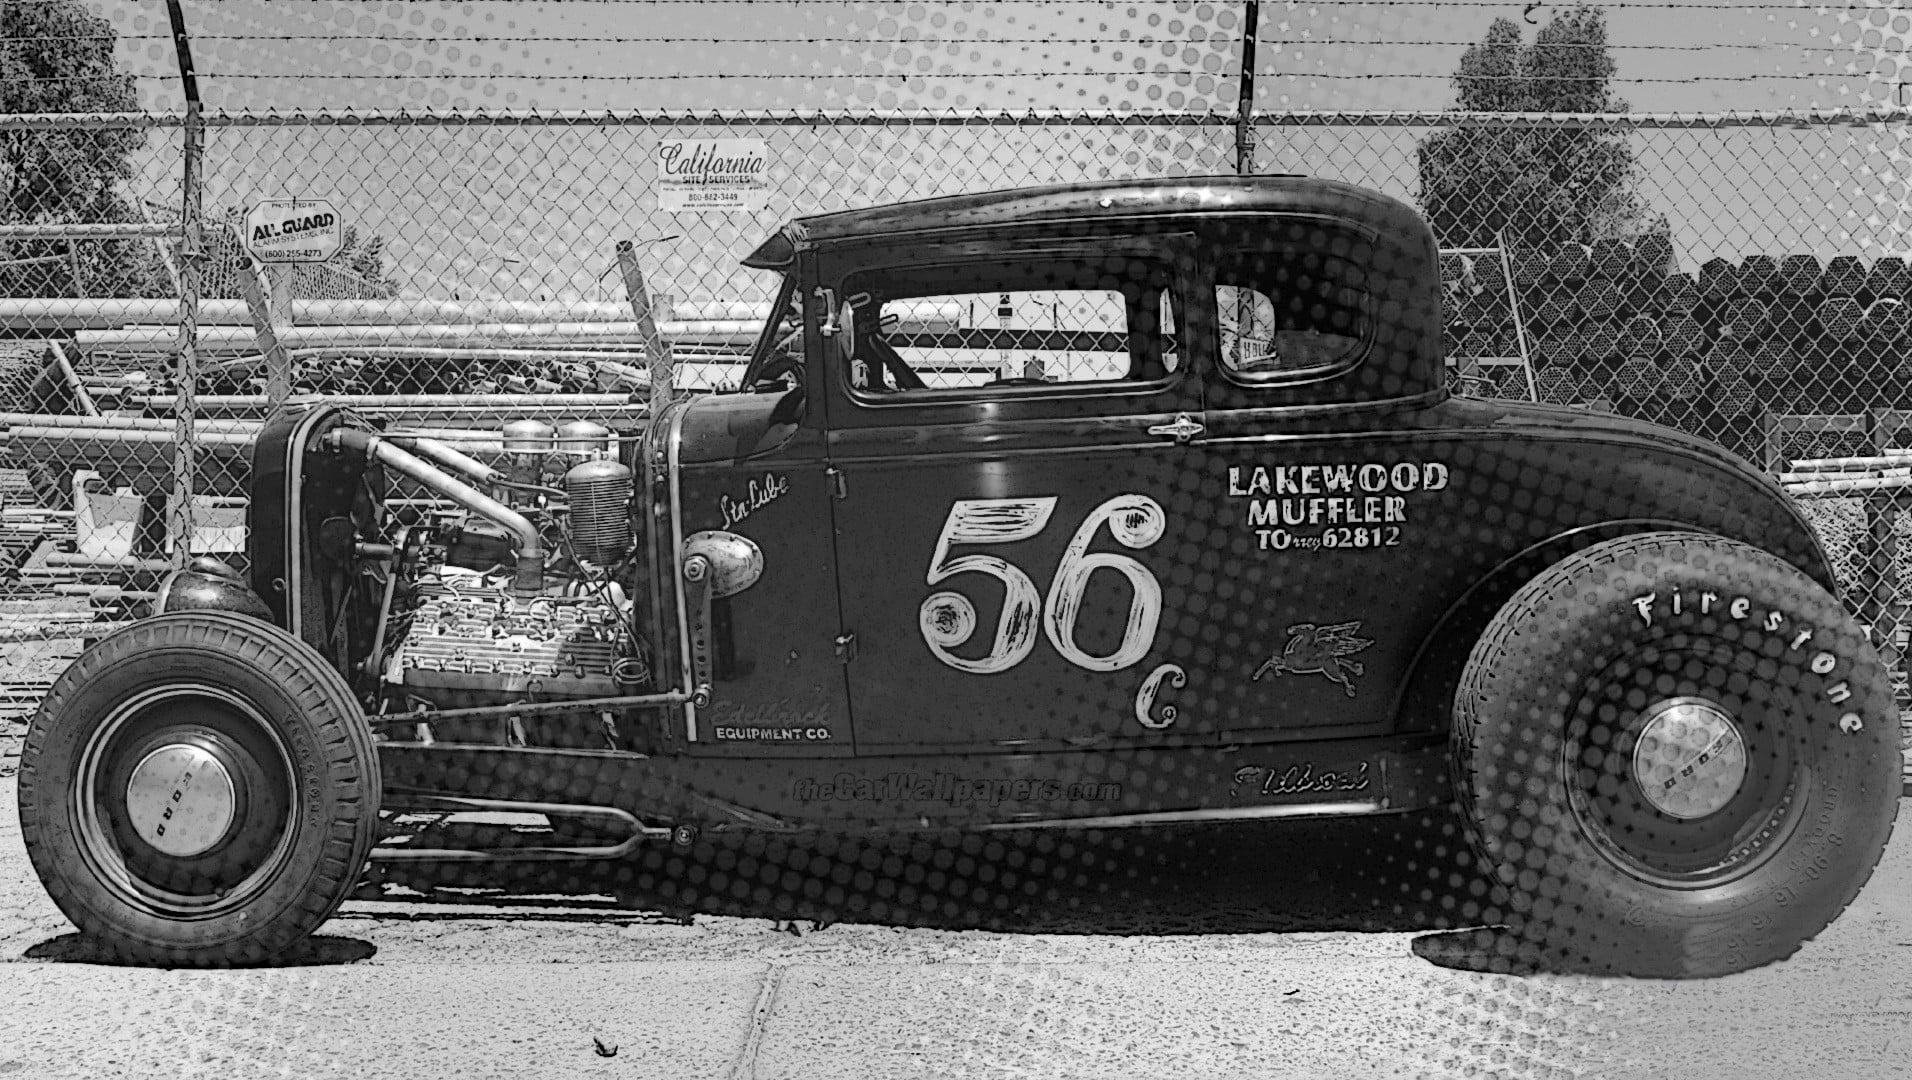 Hot Rod Cars Vintage - HD Wallpaper